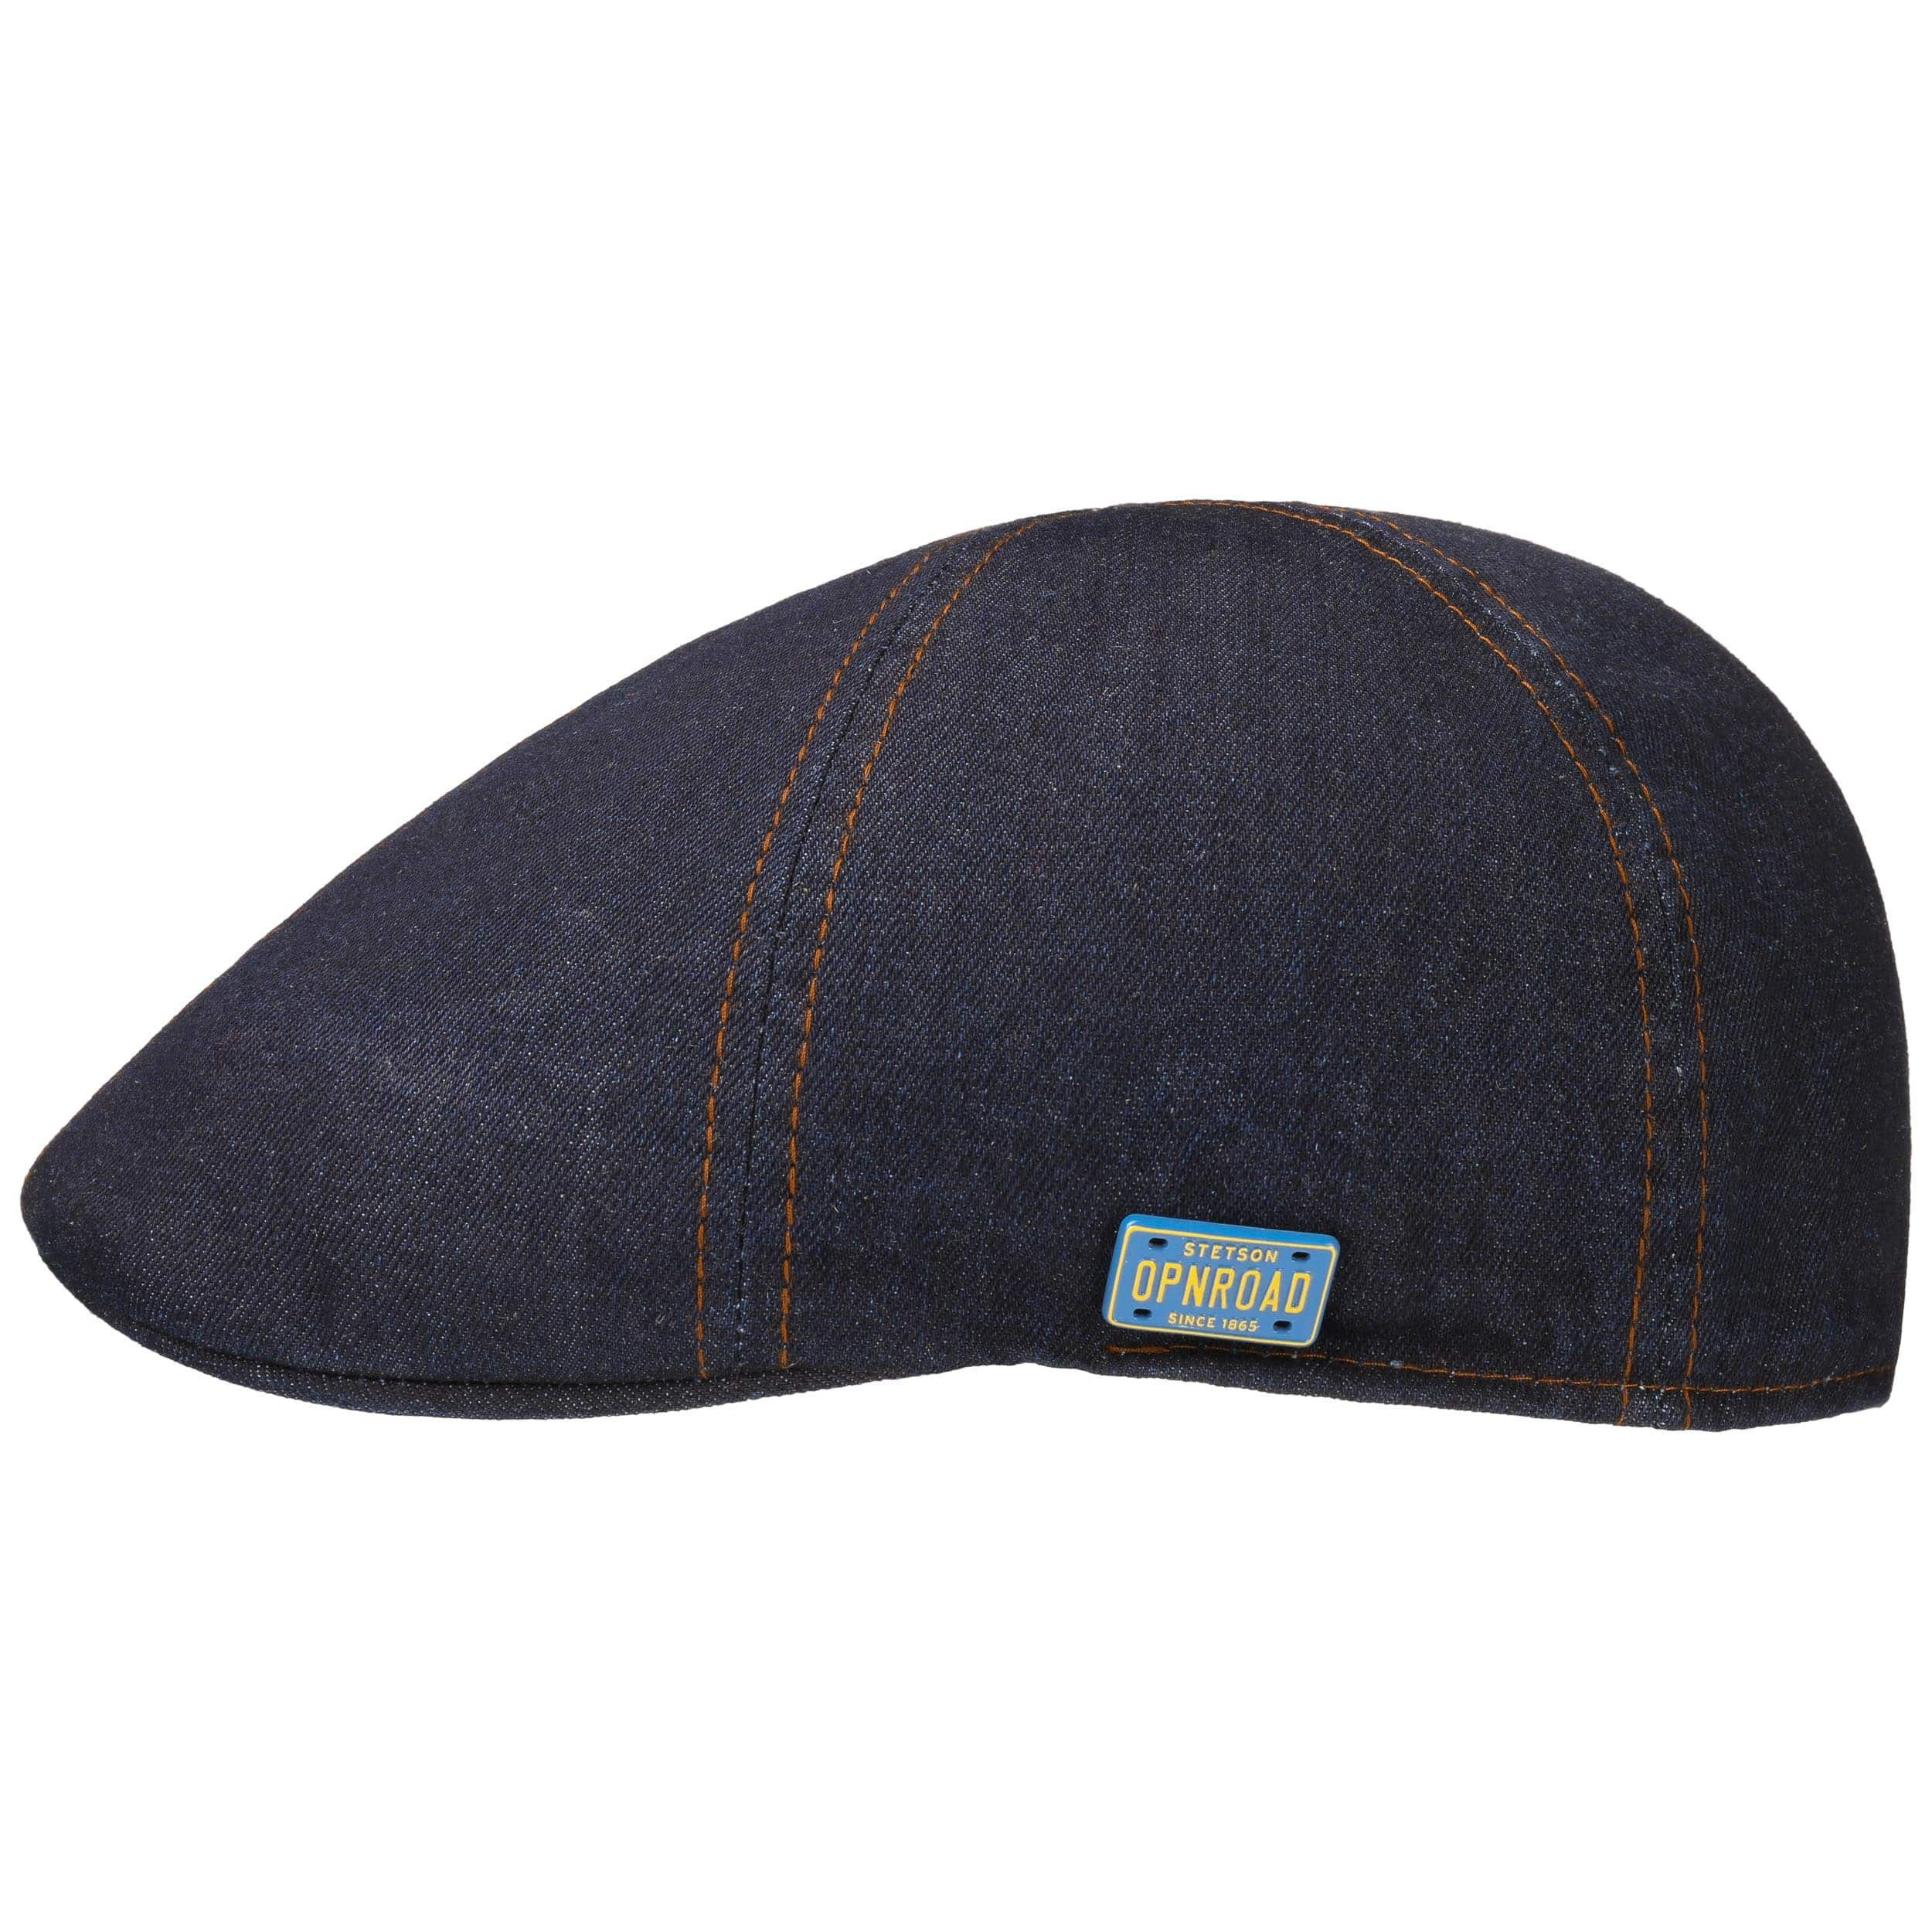 Texas Denim Contrast Stitch Flatcap denim